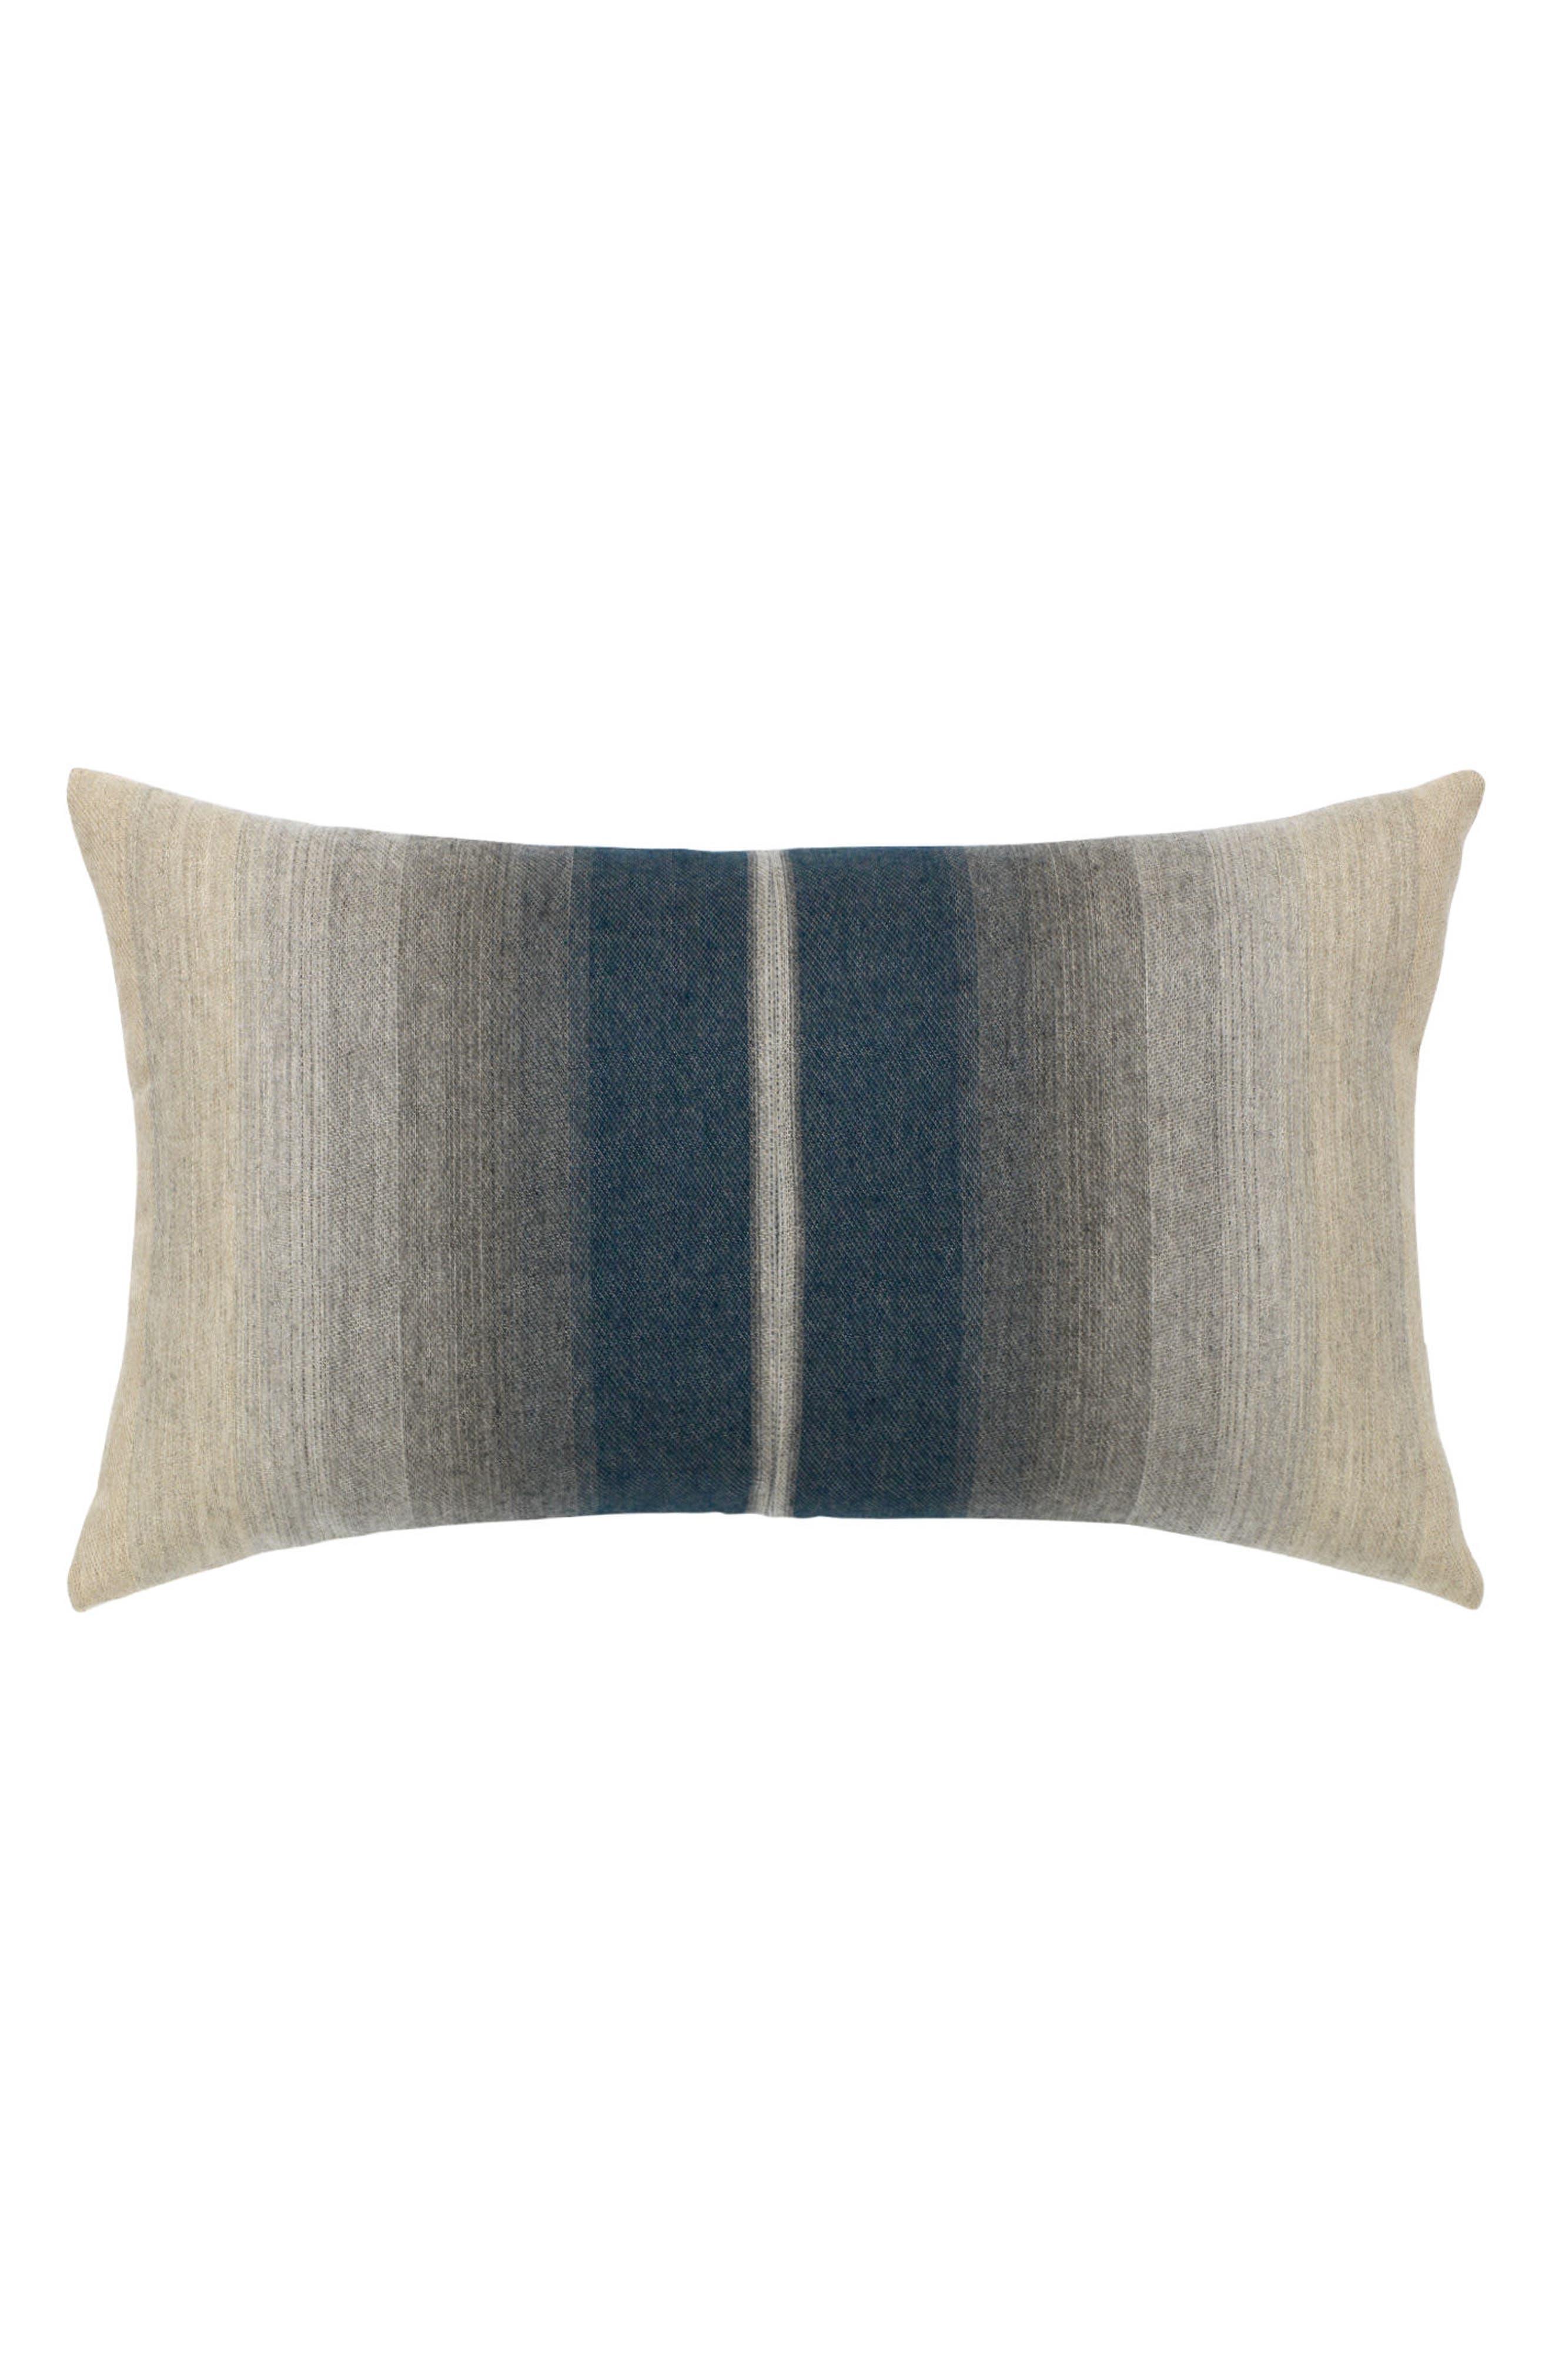 Elaine Smith Ombré Indigo Lumbar Pillow